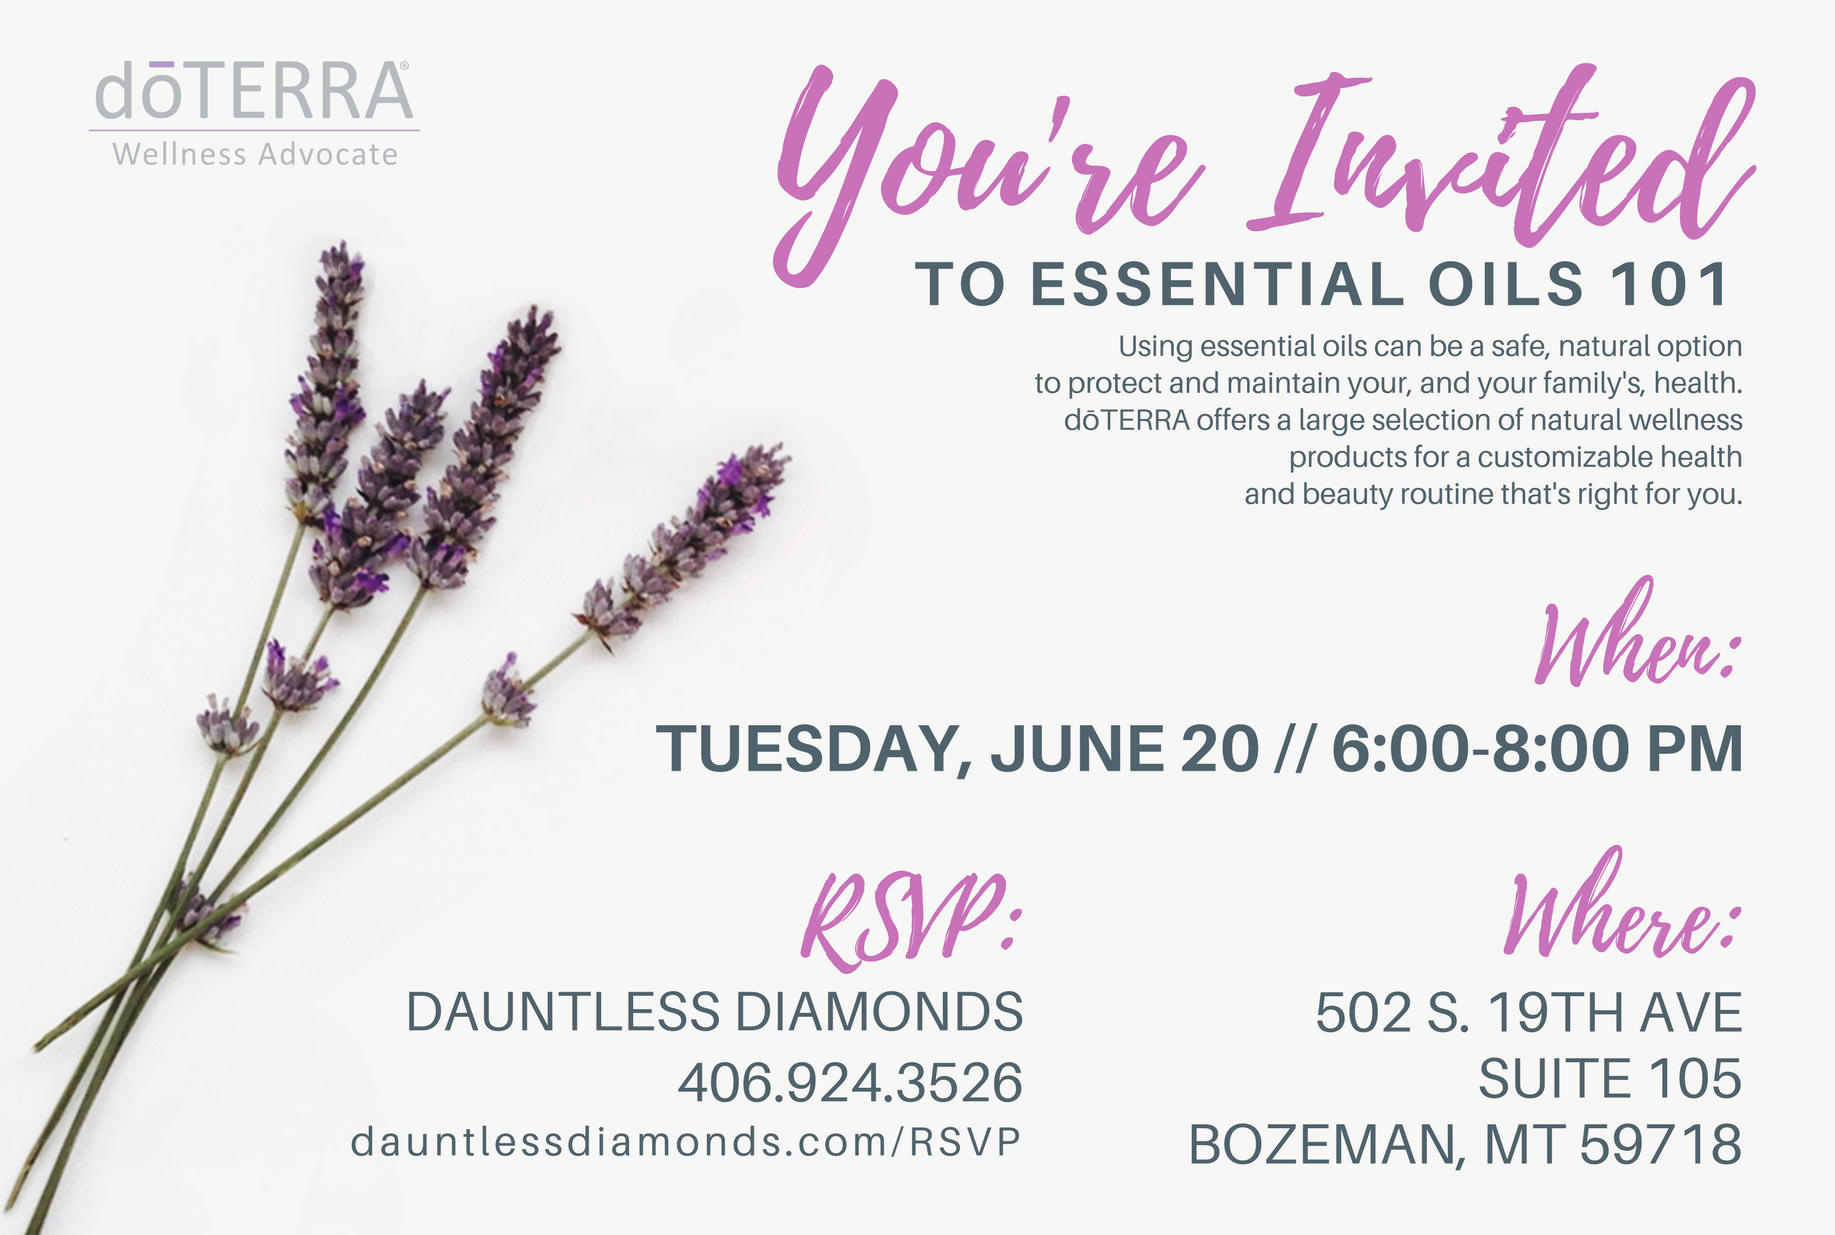 Essential Oils Class Invitation Awesome Doterra Class Invitation Lavender Ii